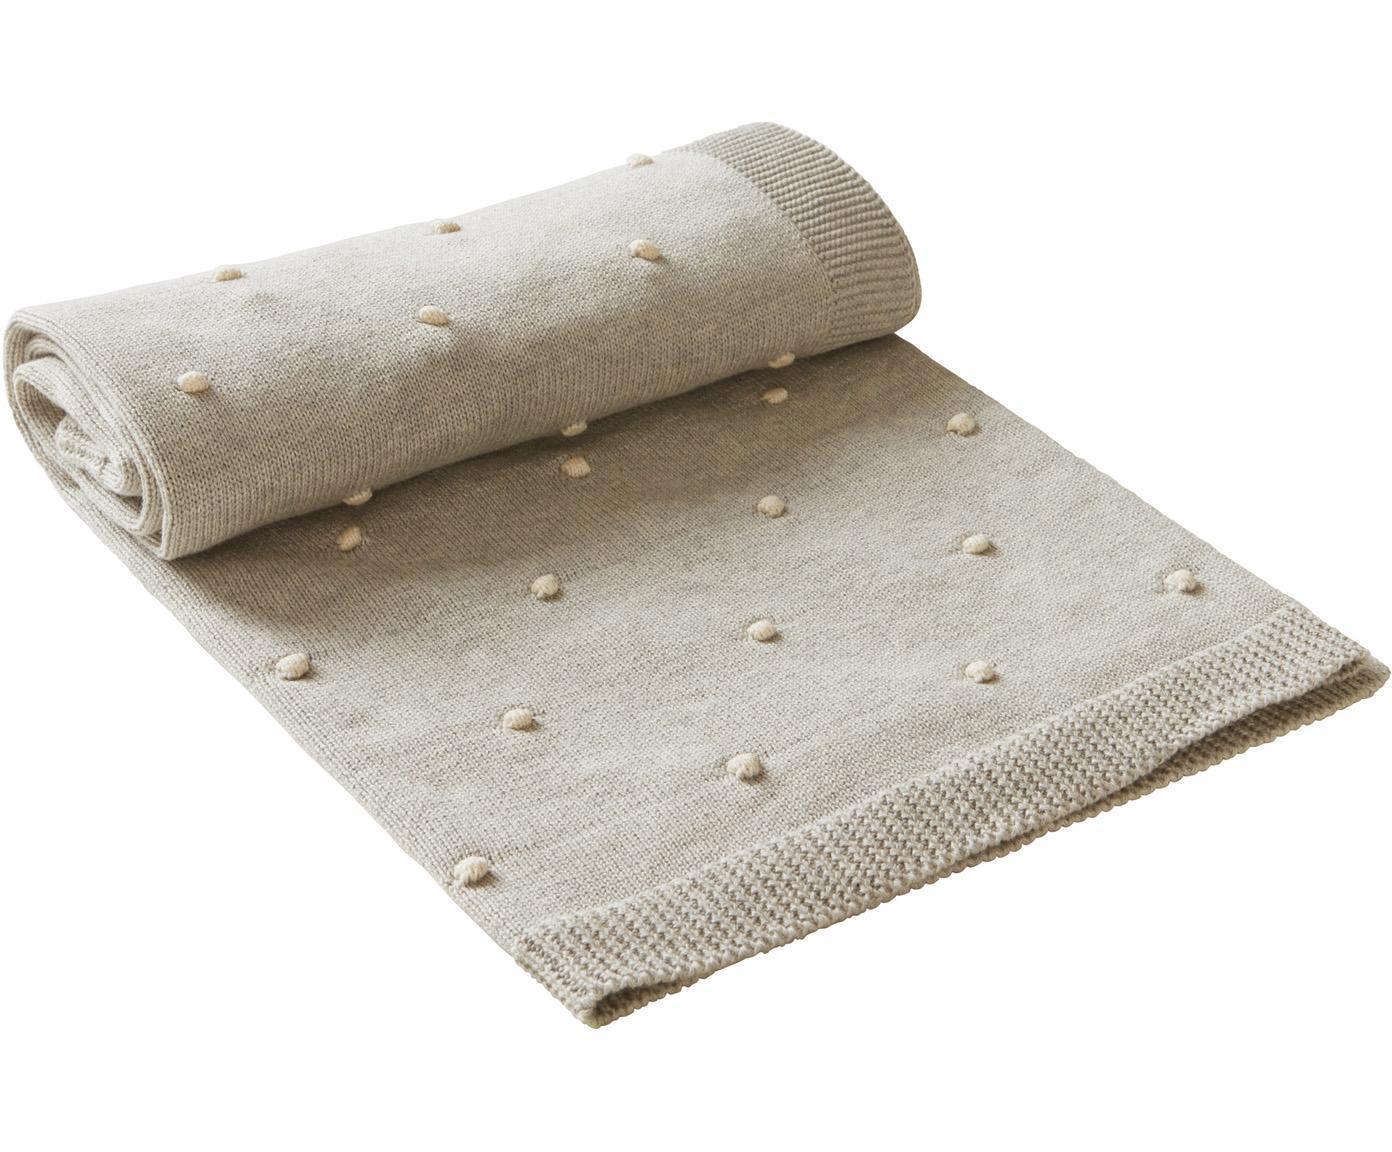 Plaid Alessia, 100% cotone biologico, Beige, Larg. 80 x Lung. 100 cm